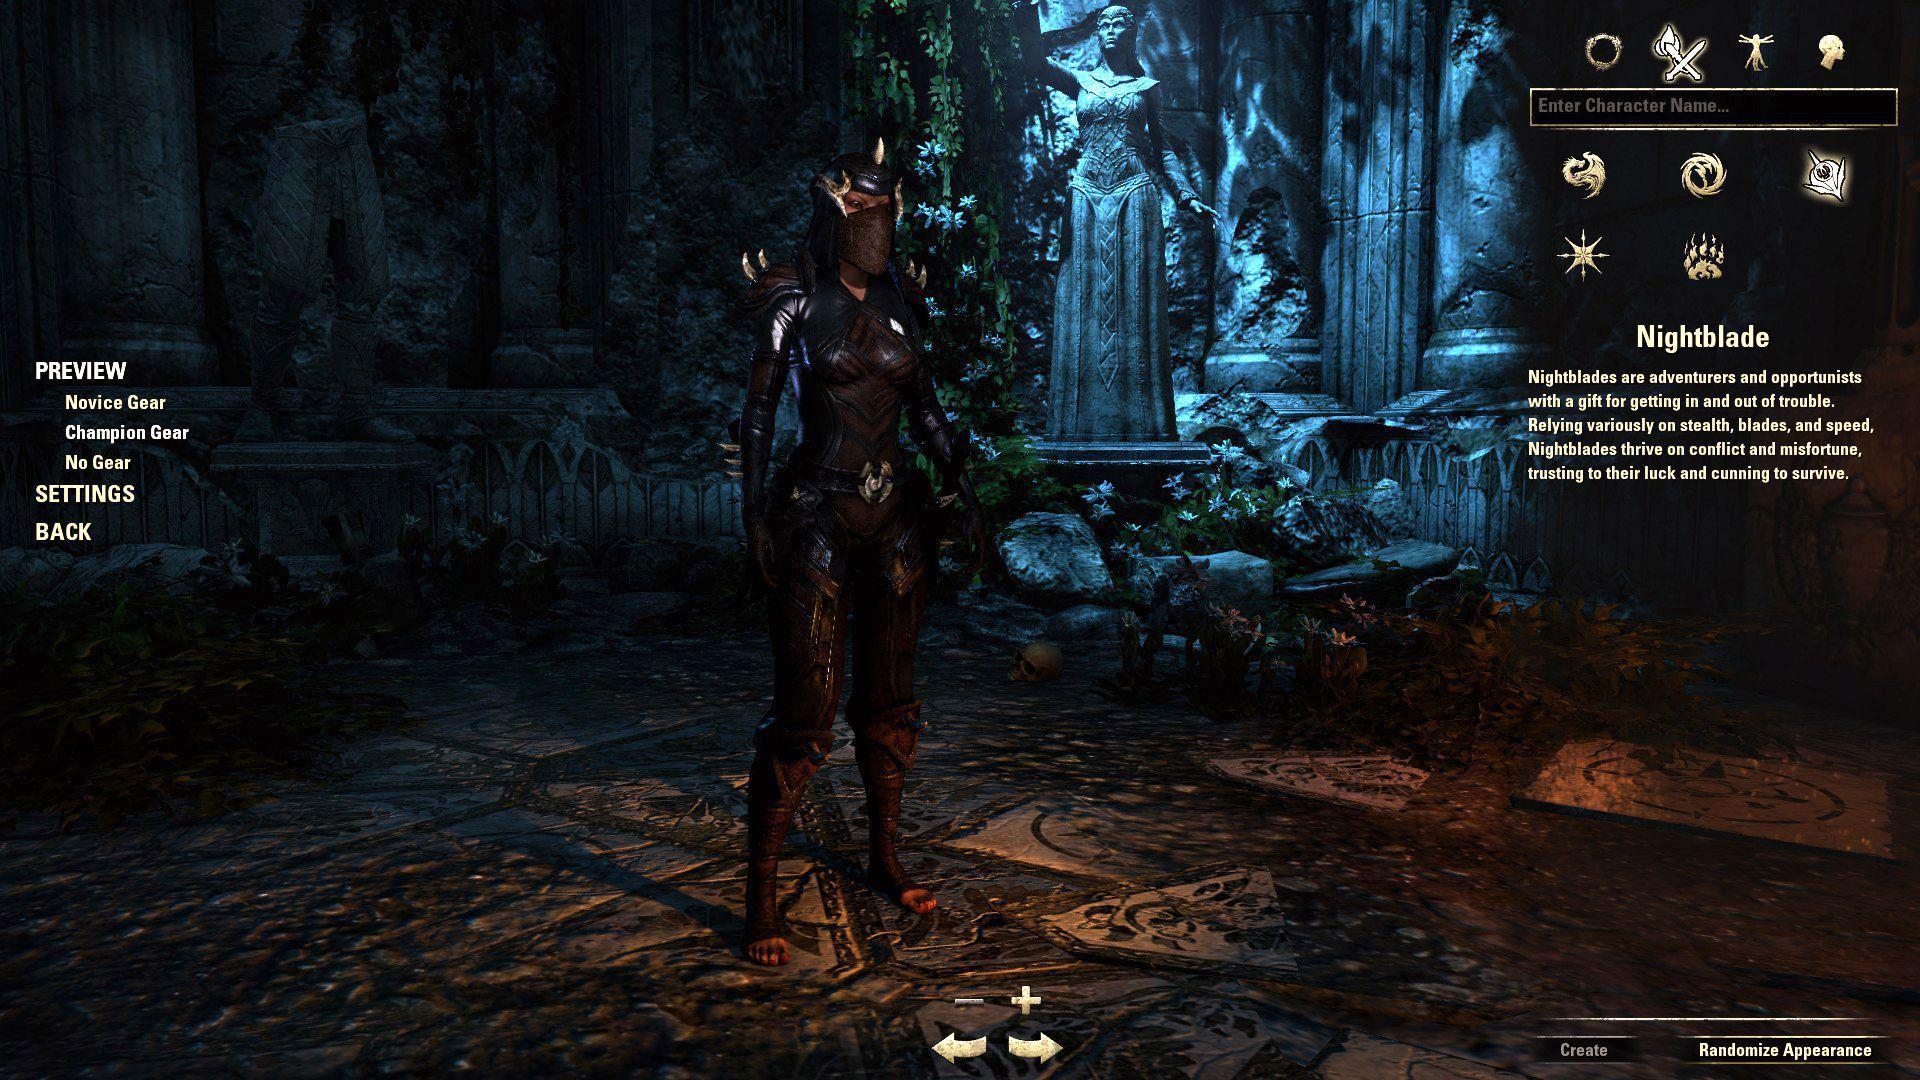 Nightblade, The Elder Scrolls Online Class